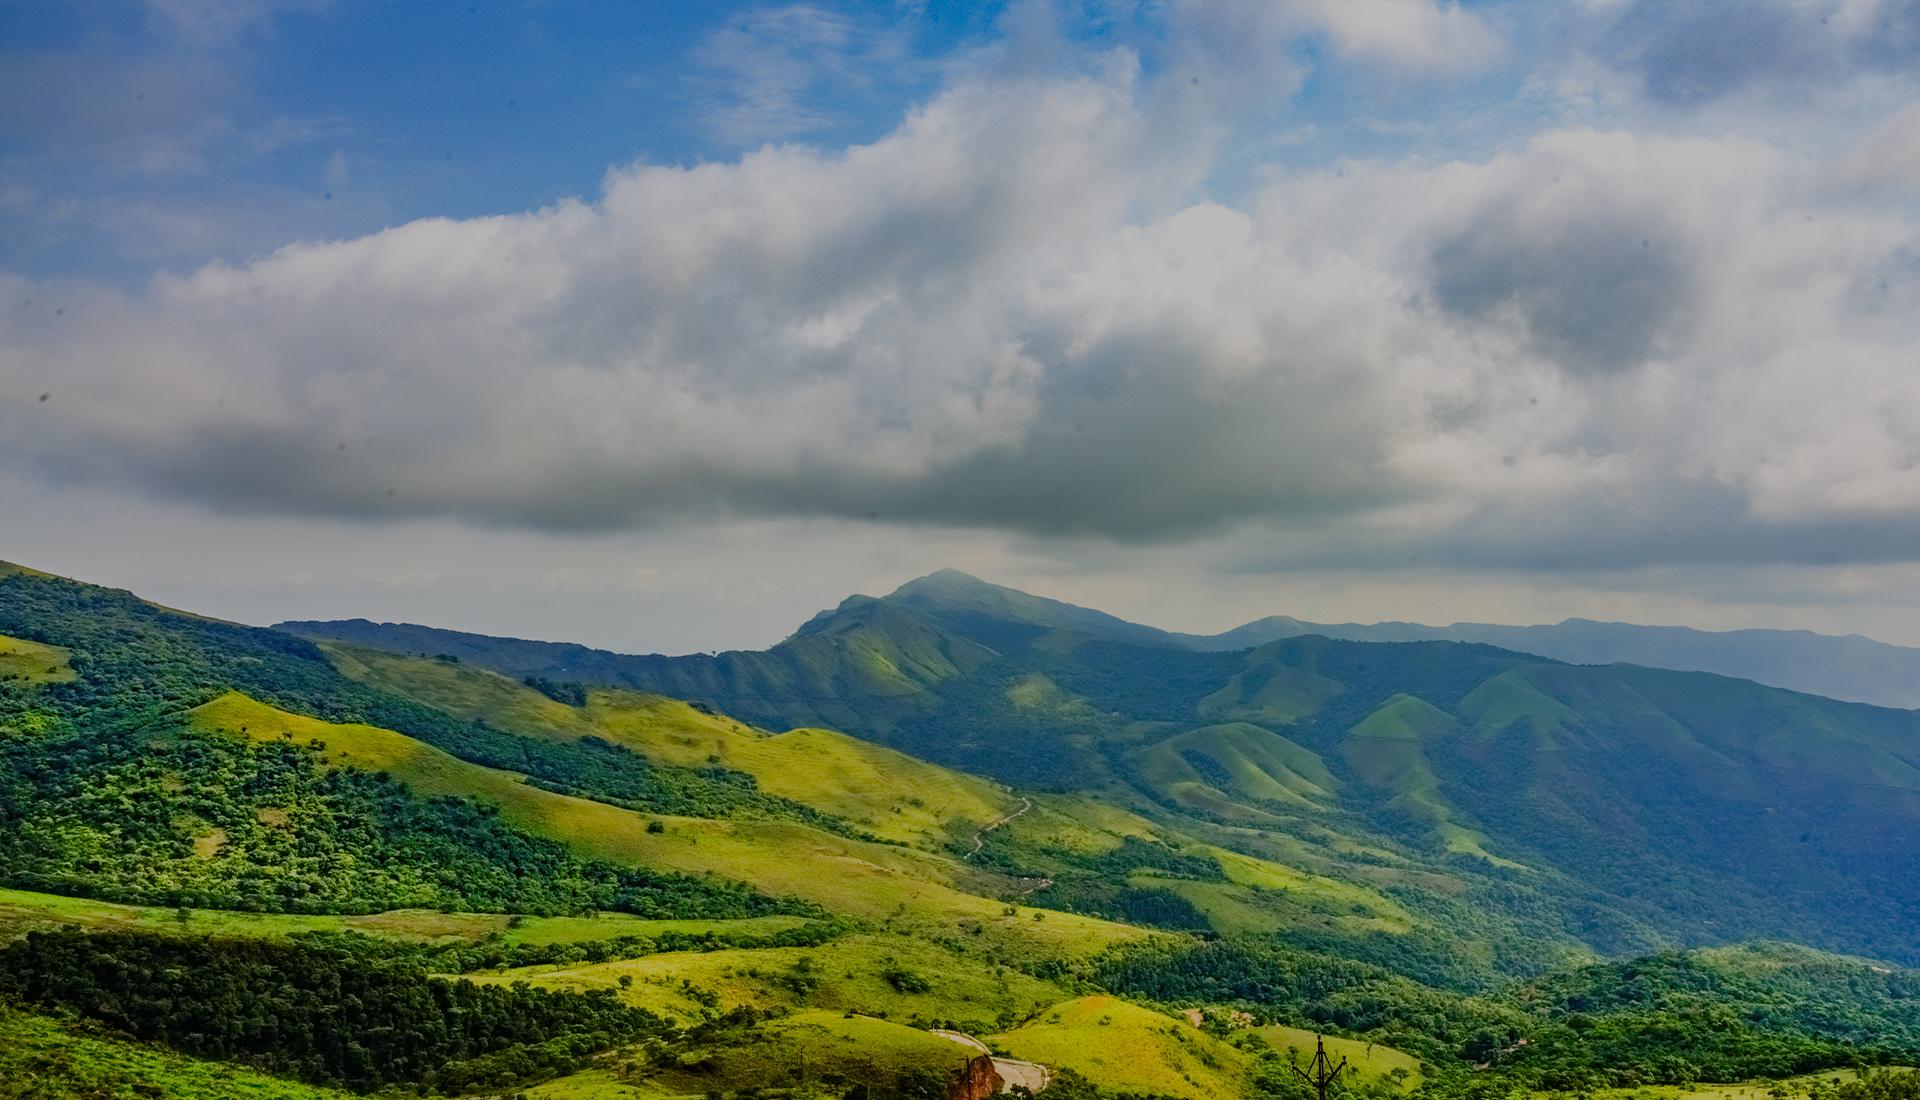 Mullayanagiri Chikkamagaluru